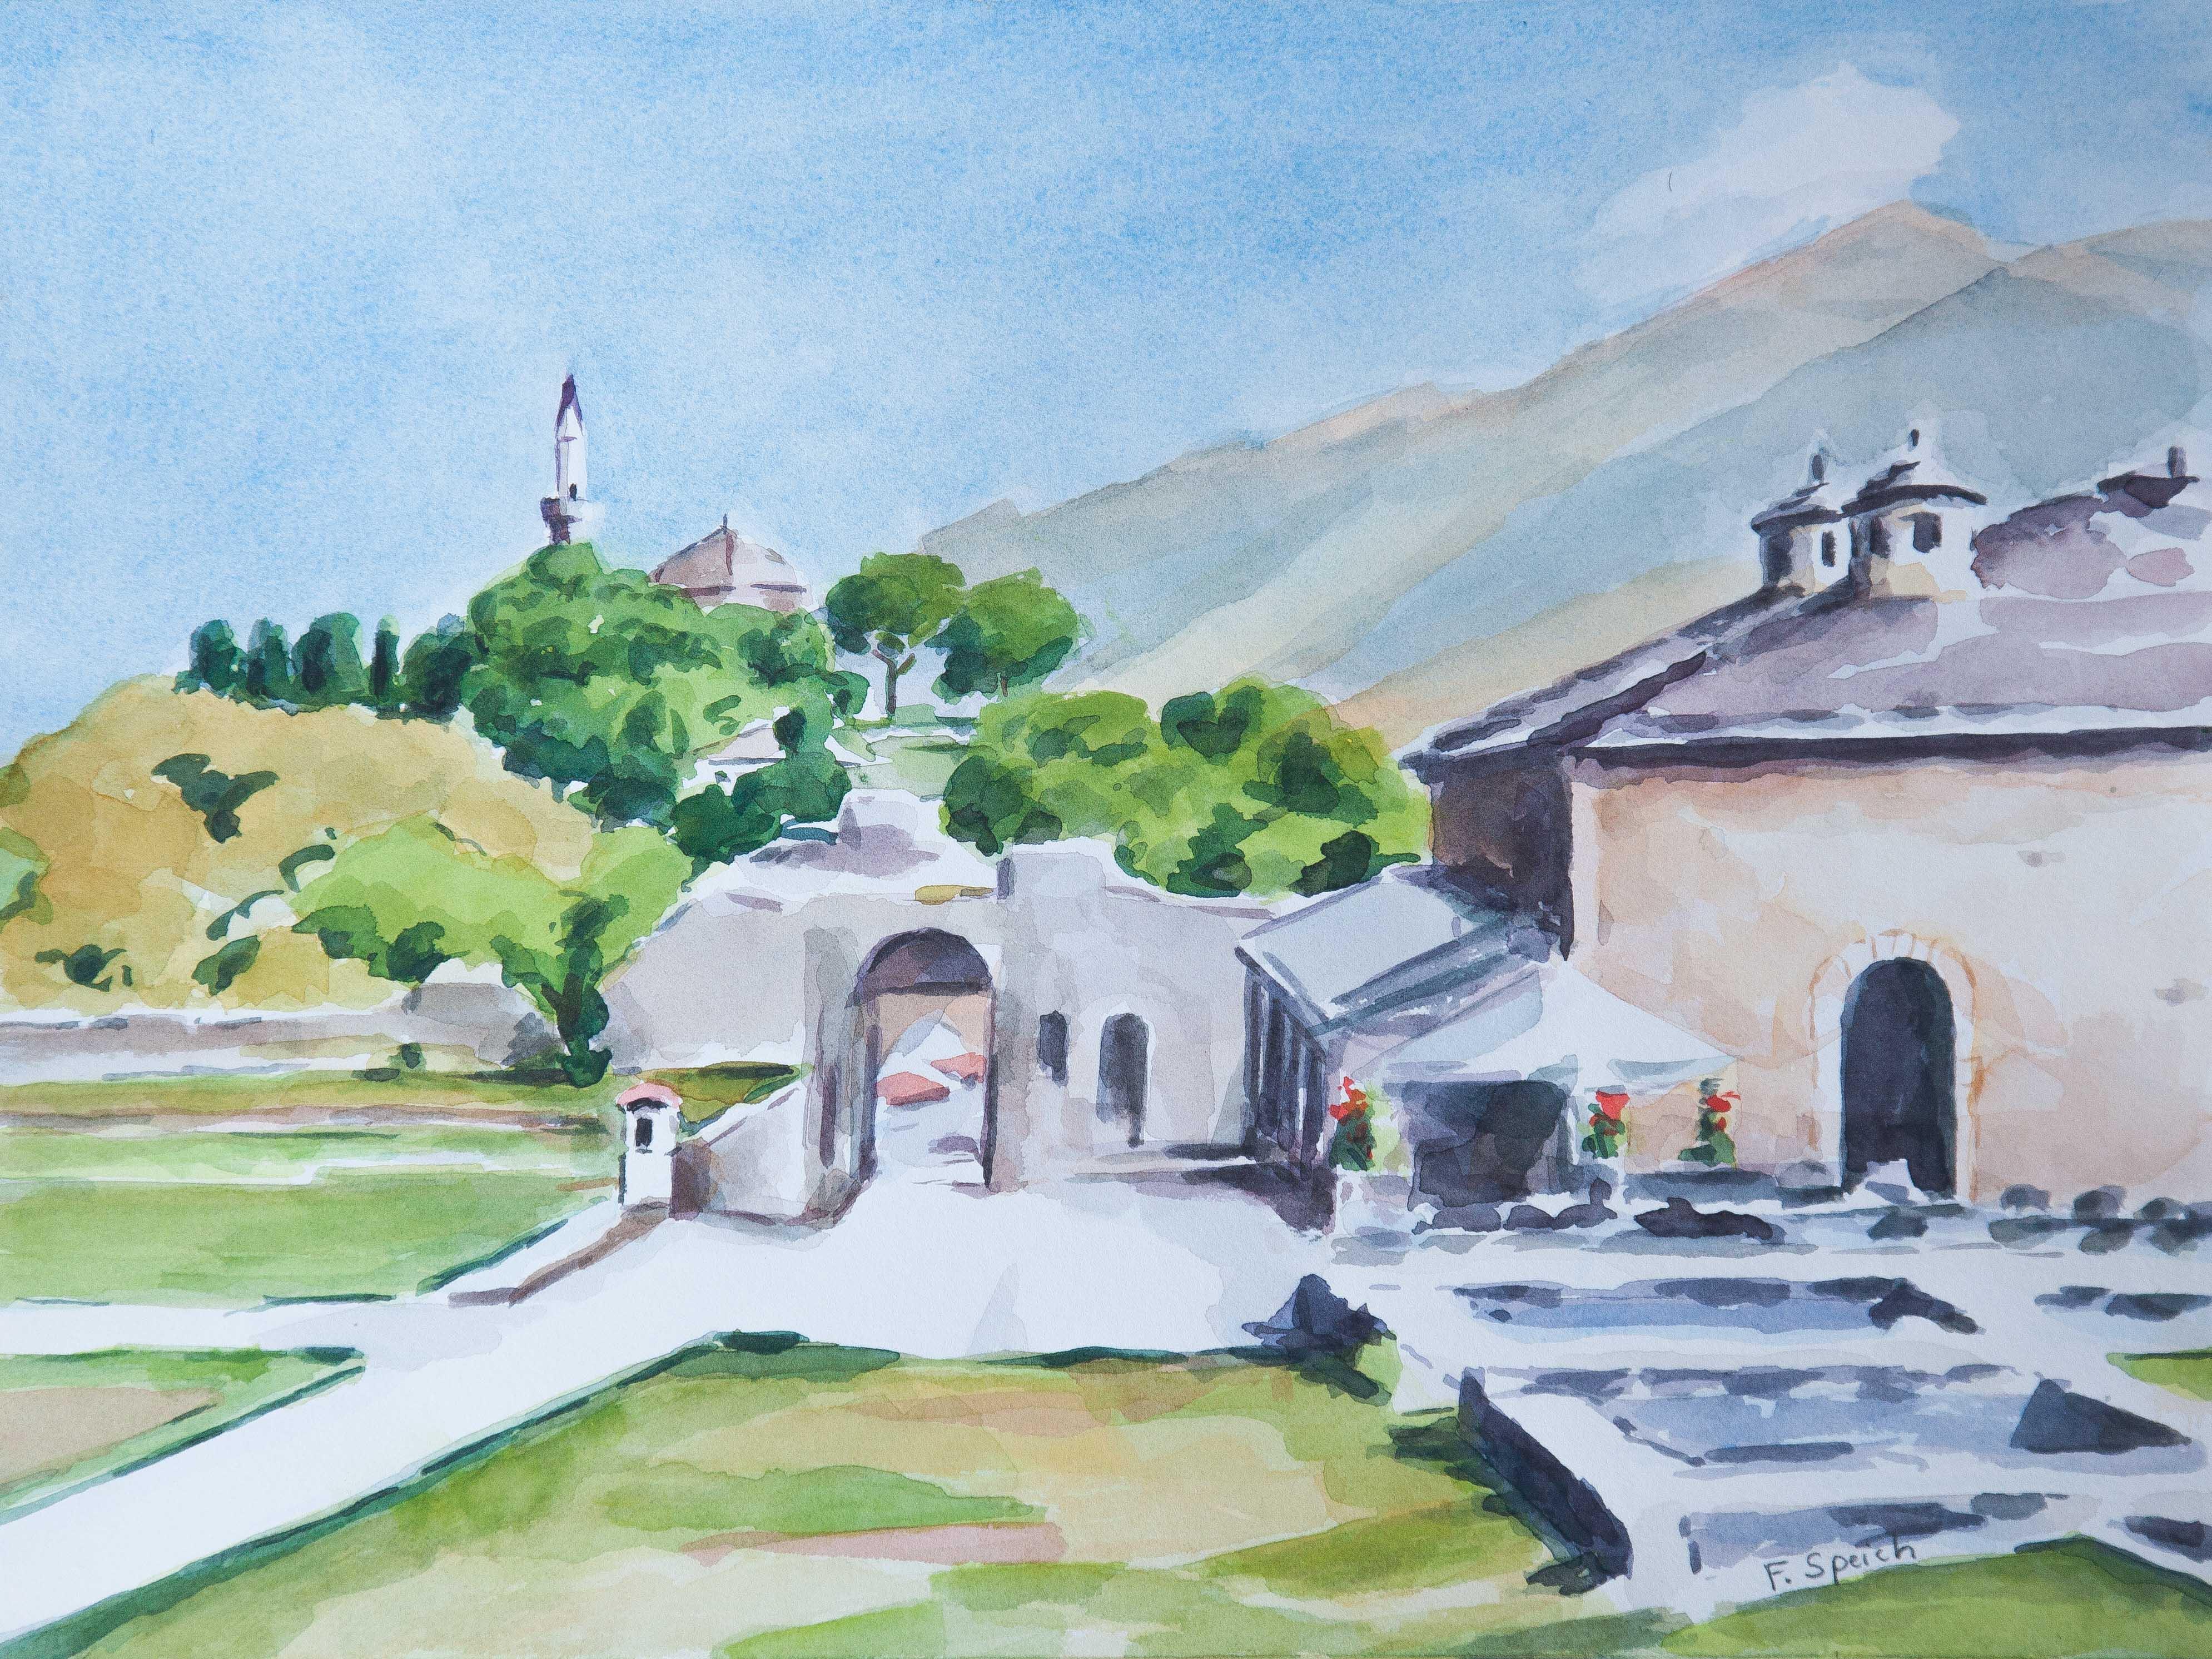 Grèce - Ioannina - Mosquée Aslan Aga